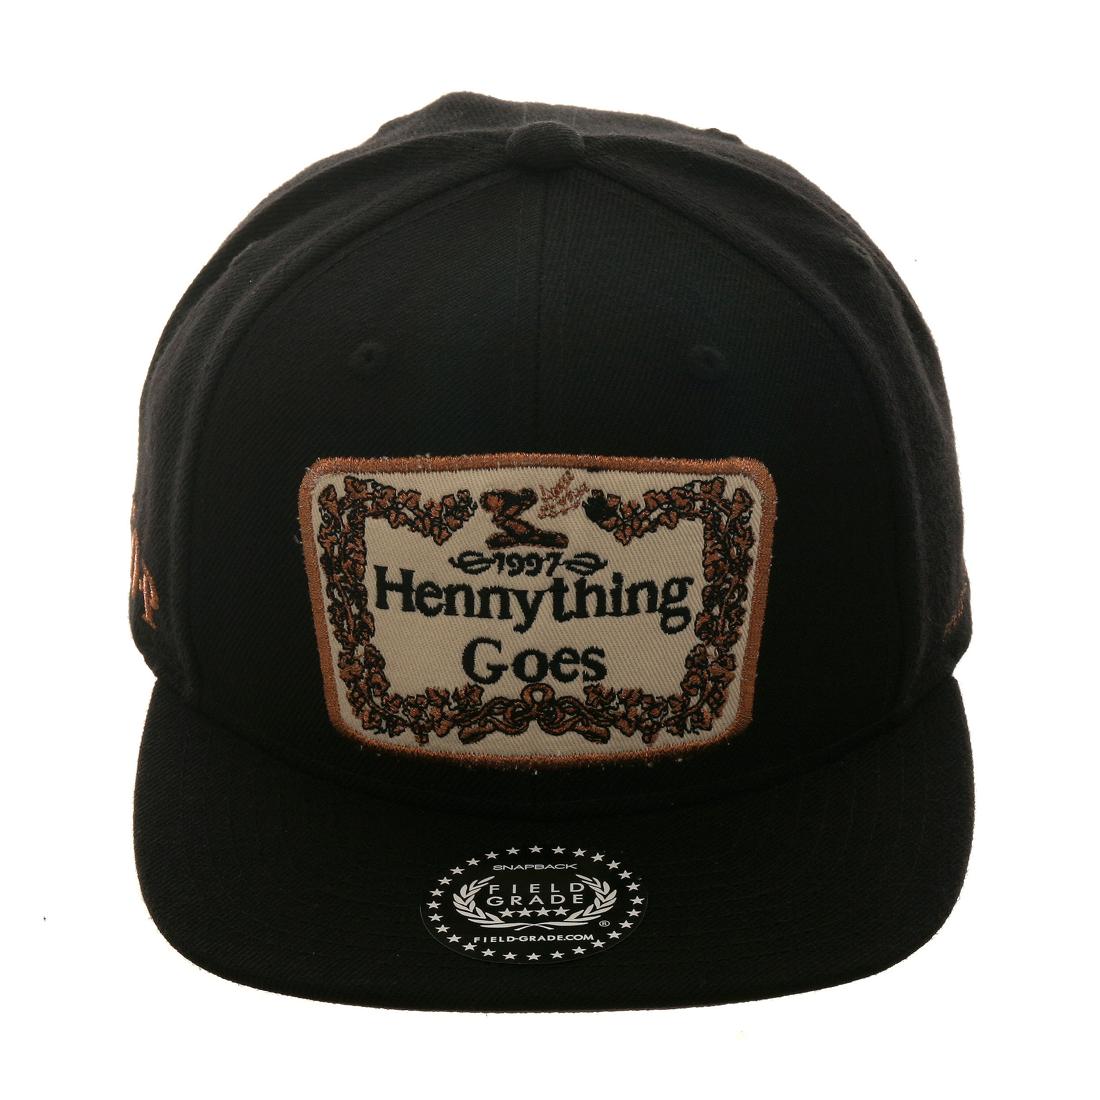 Field Grade Hennything Goes Snapback Hat 916ef06b02b